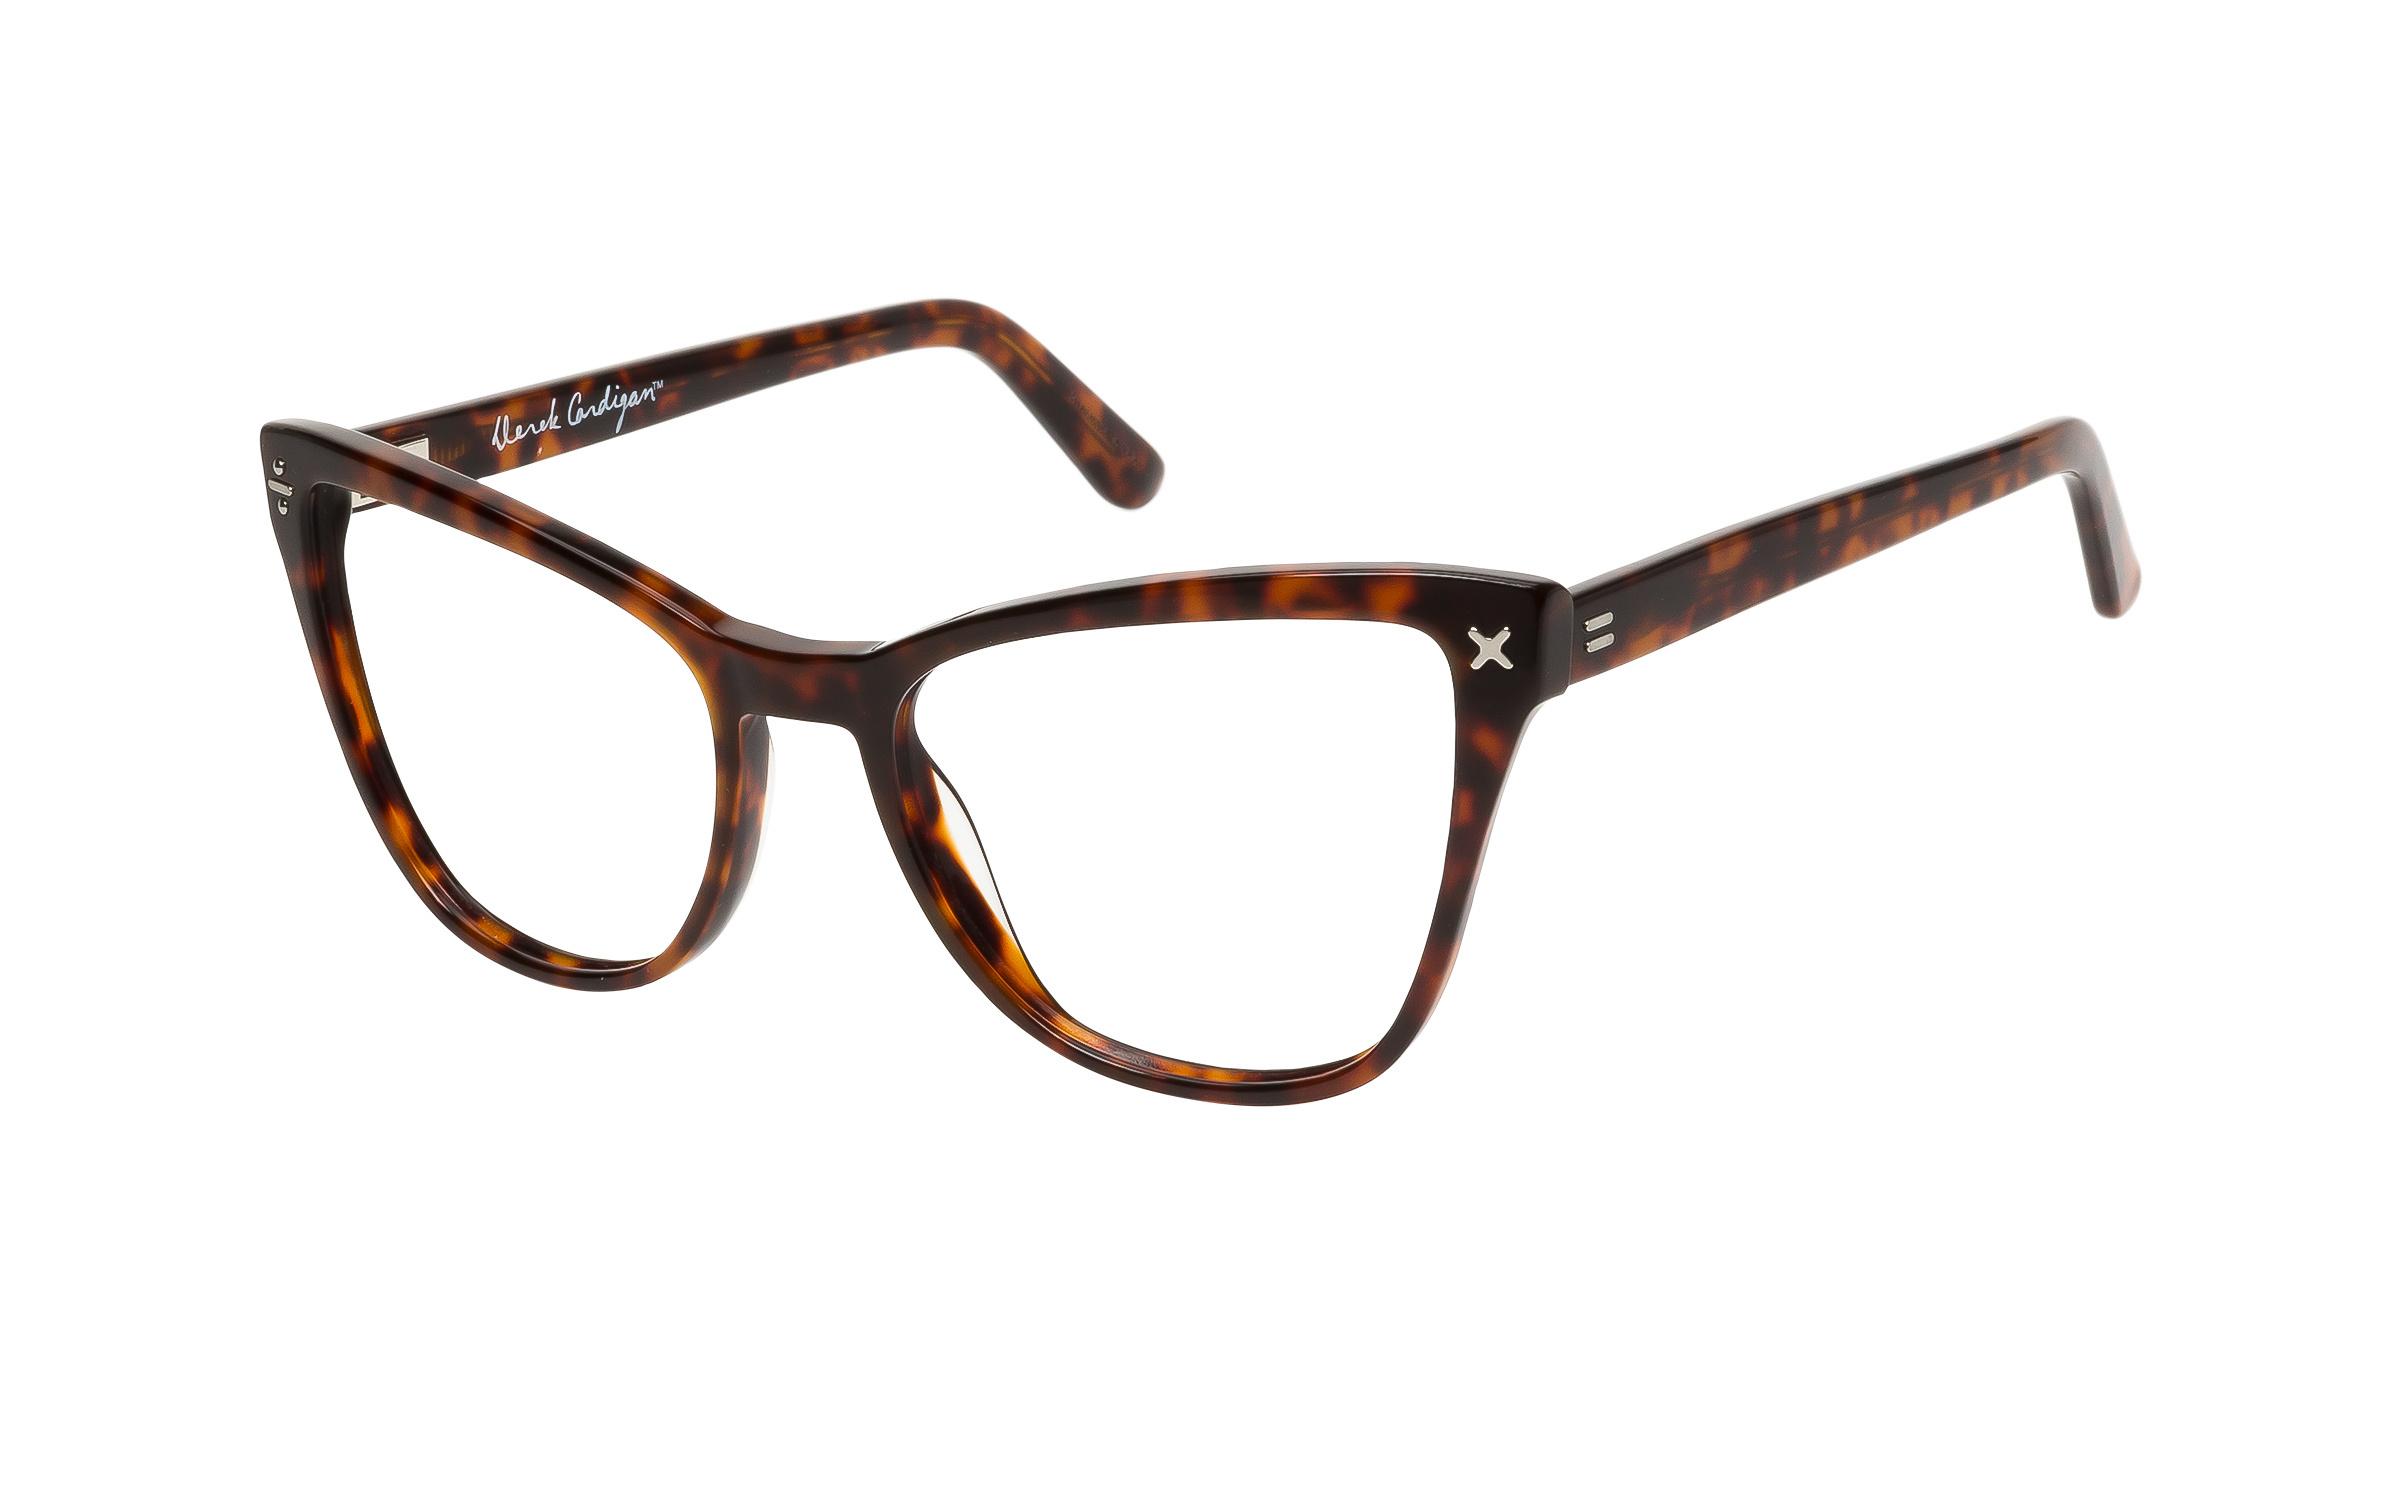 Women's Vintage Glasses Tortoise Derek Cardigan Online Clearly